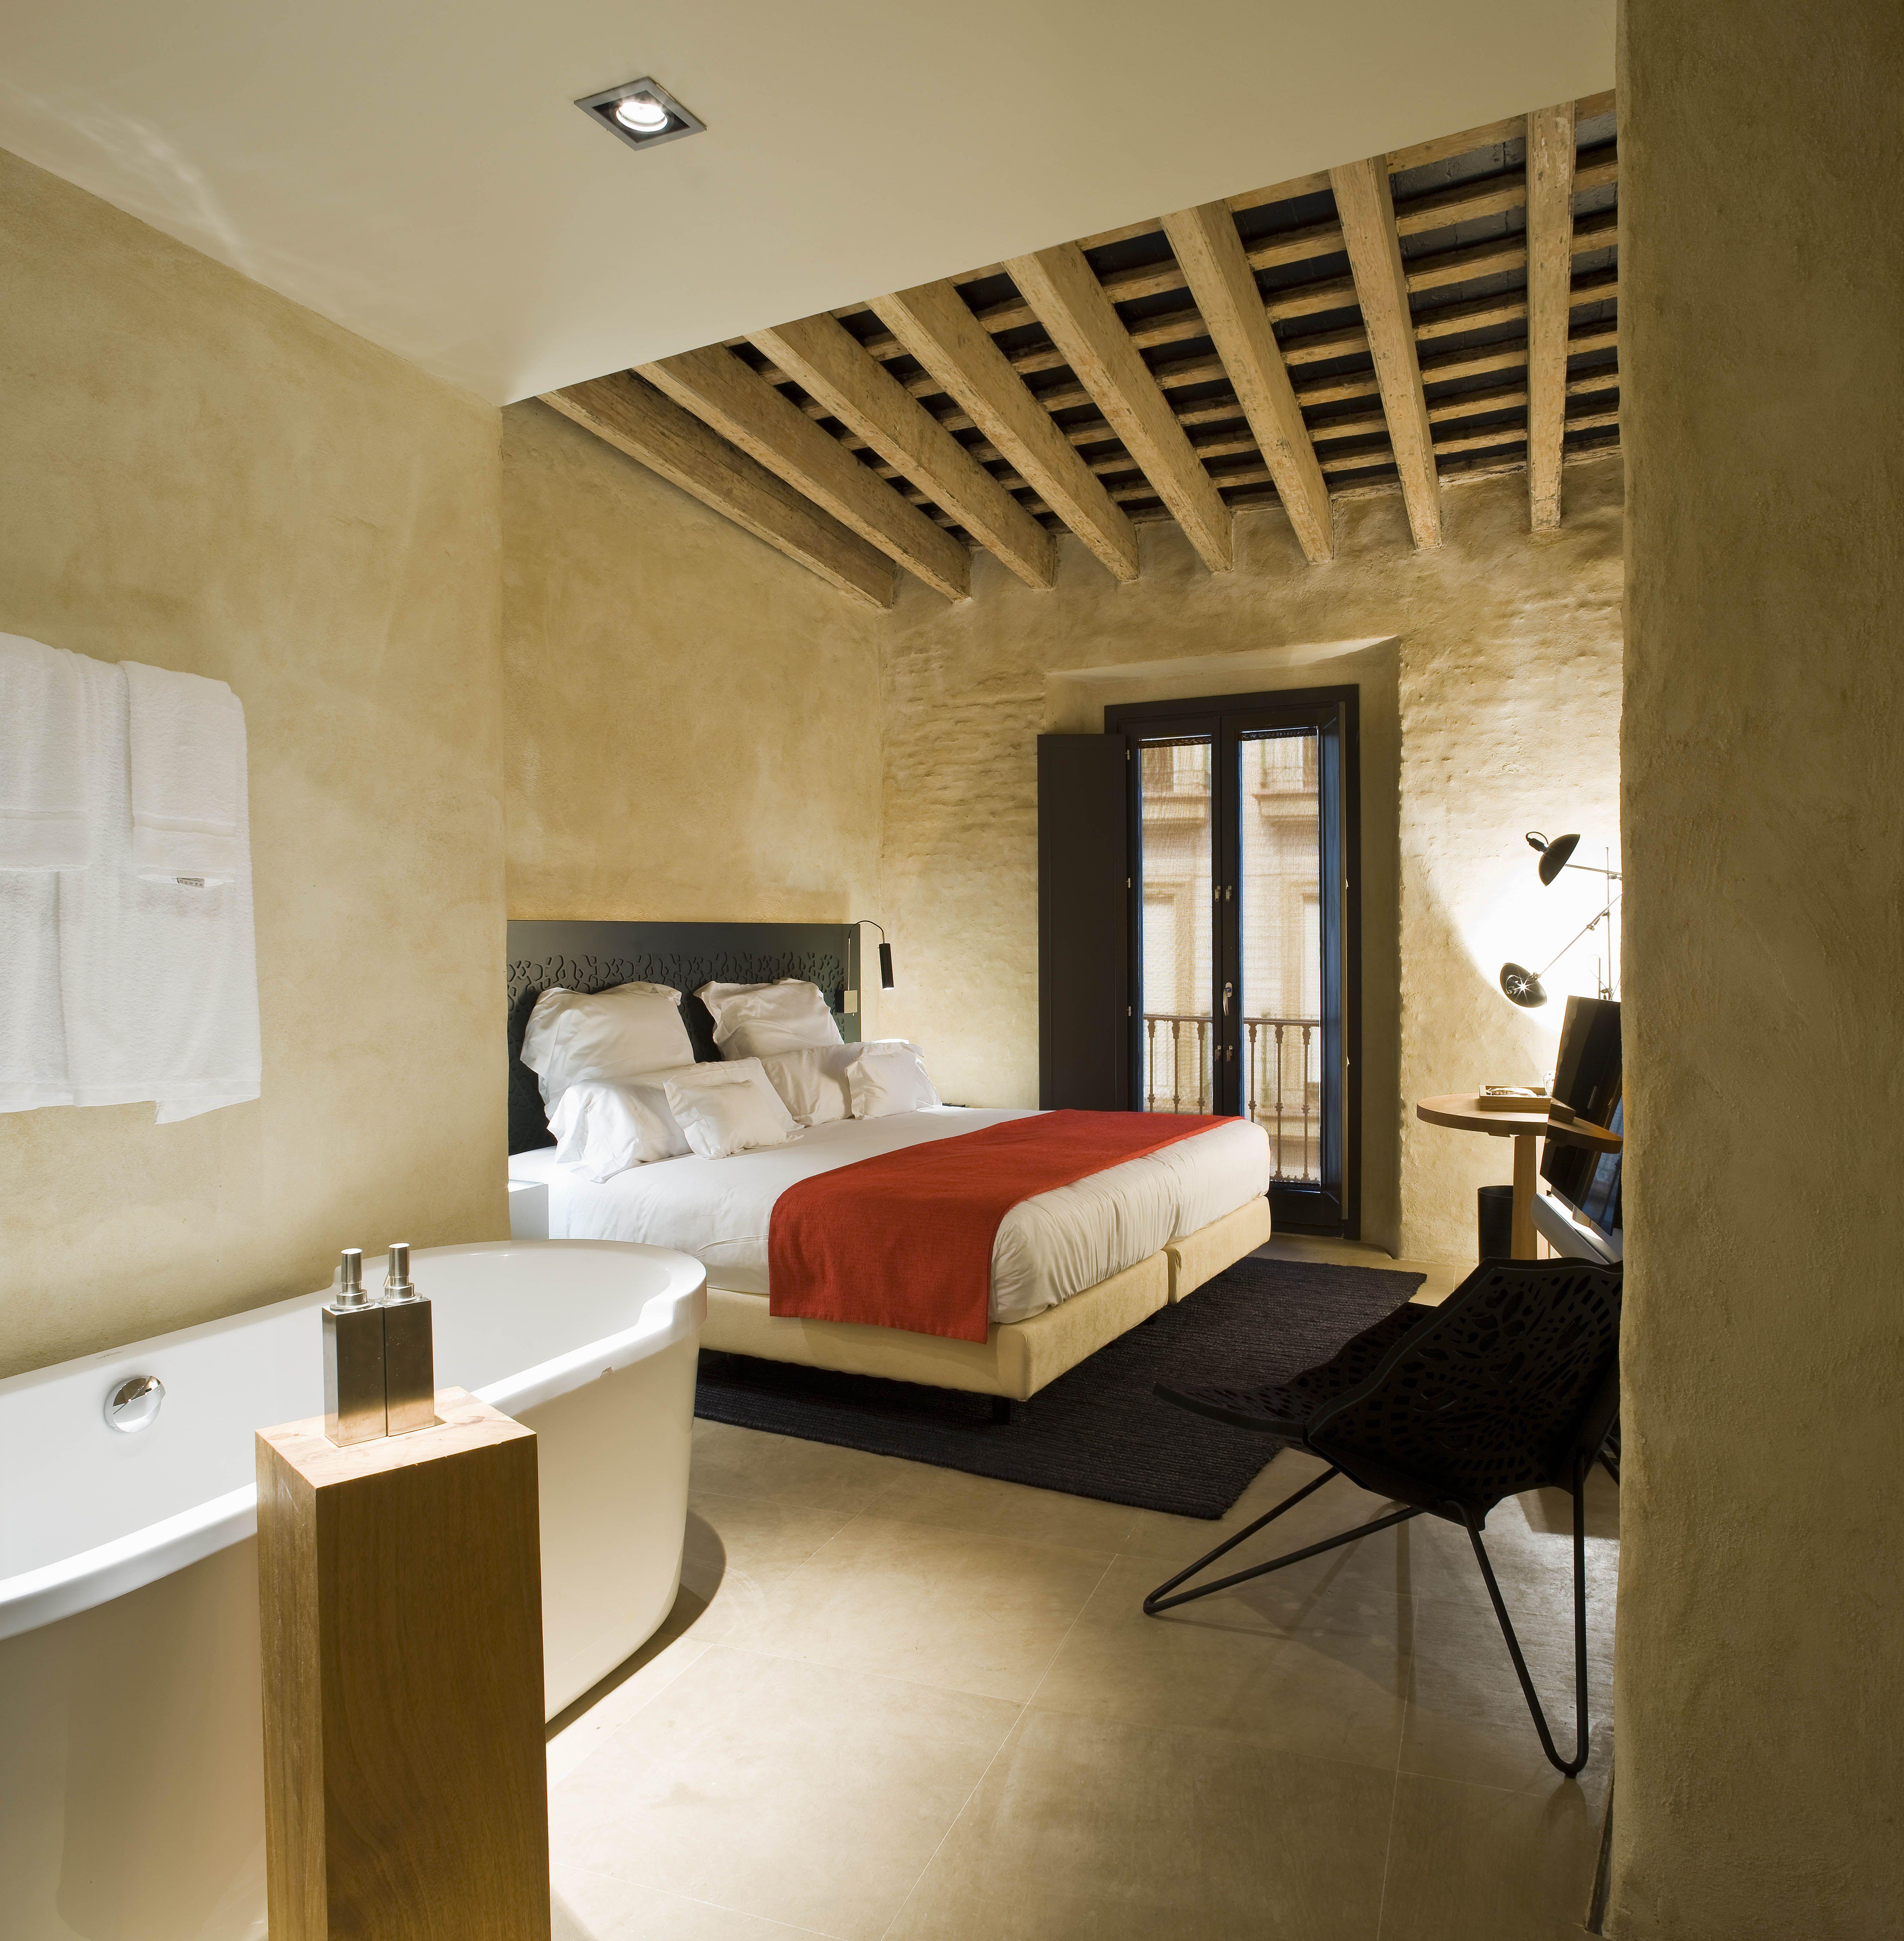 Hoteles hotel eme sevilla hotels restaurante hotel hotel sevilla sandra tarruella - Spa eme sevilla ...